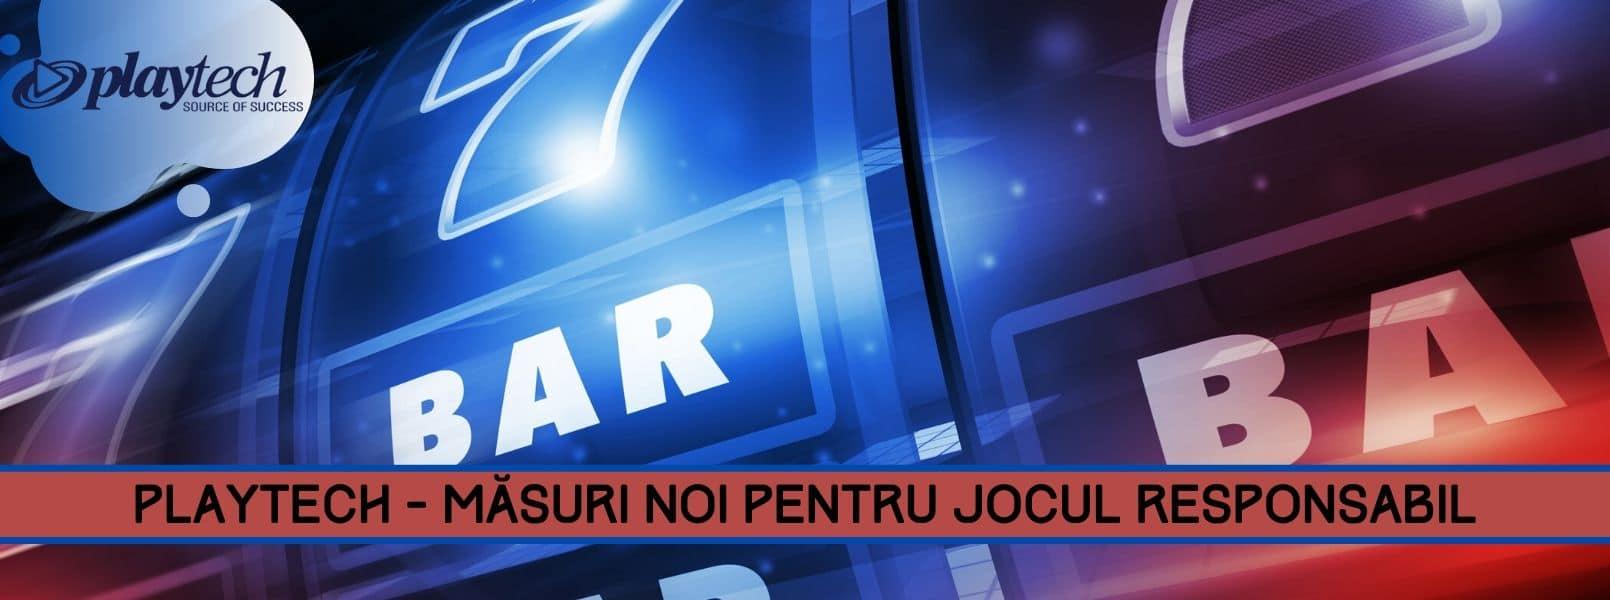 https://www.supercazino.ro/wp-content/uploads/2020/07/măsuri-pentru-jocul-responsabil-banner.jpg